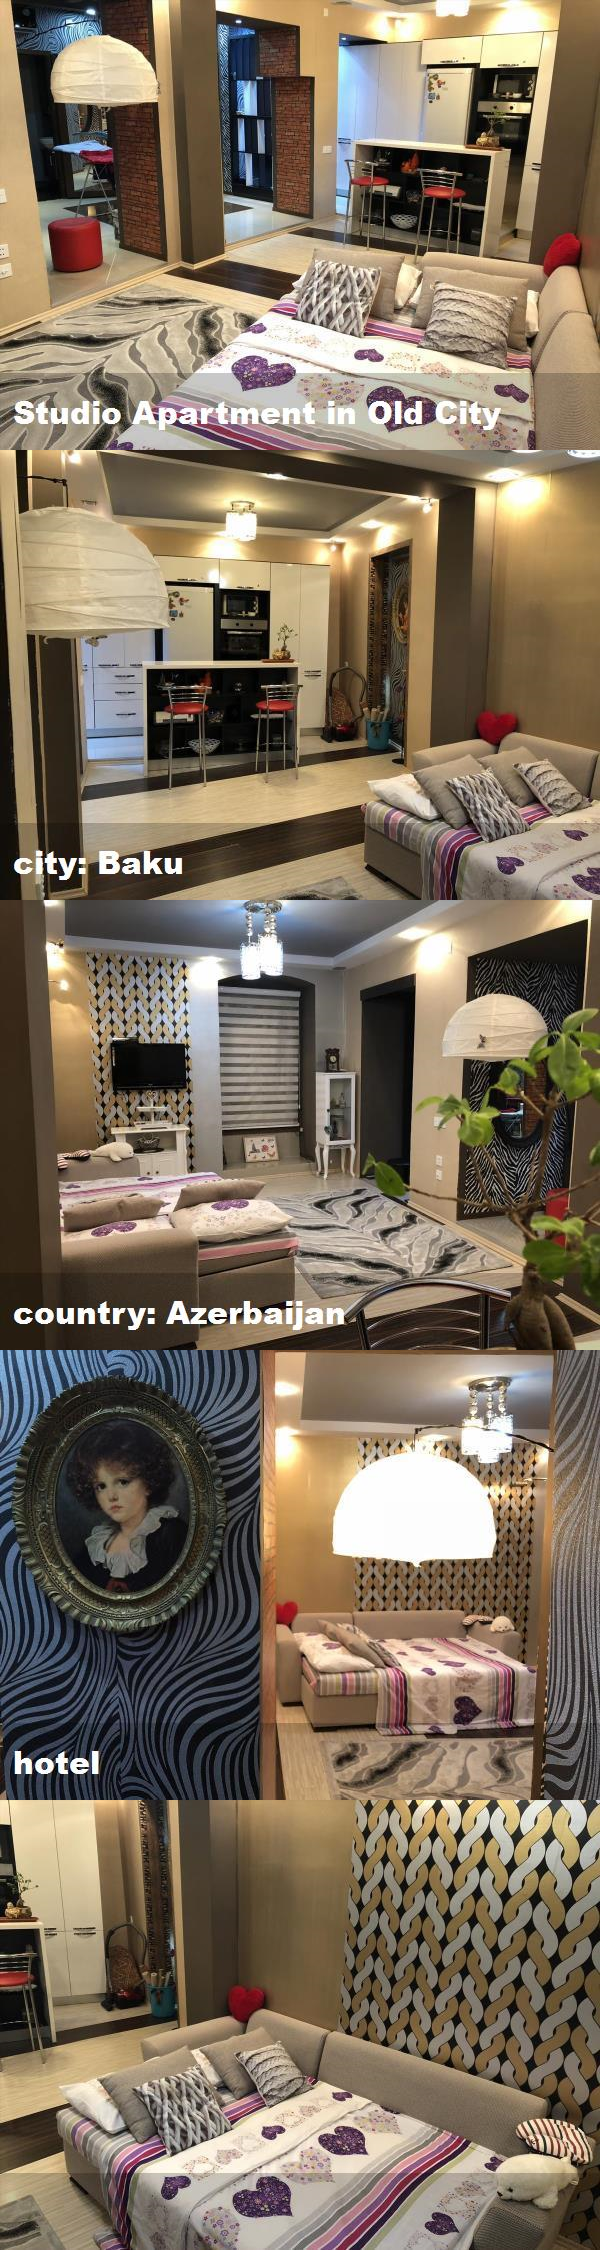 Pin On Azerbaijan Hotels